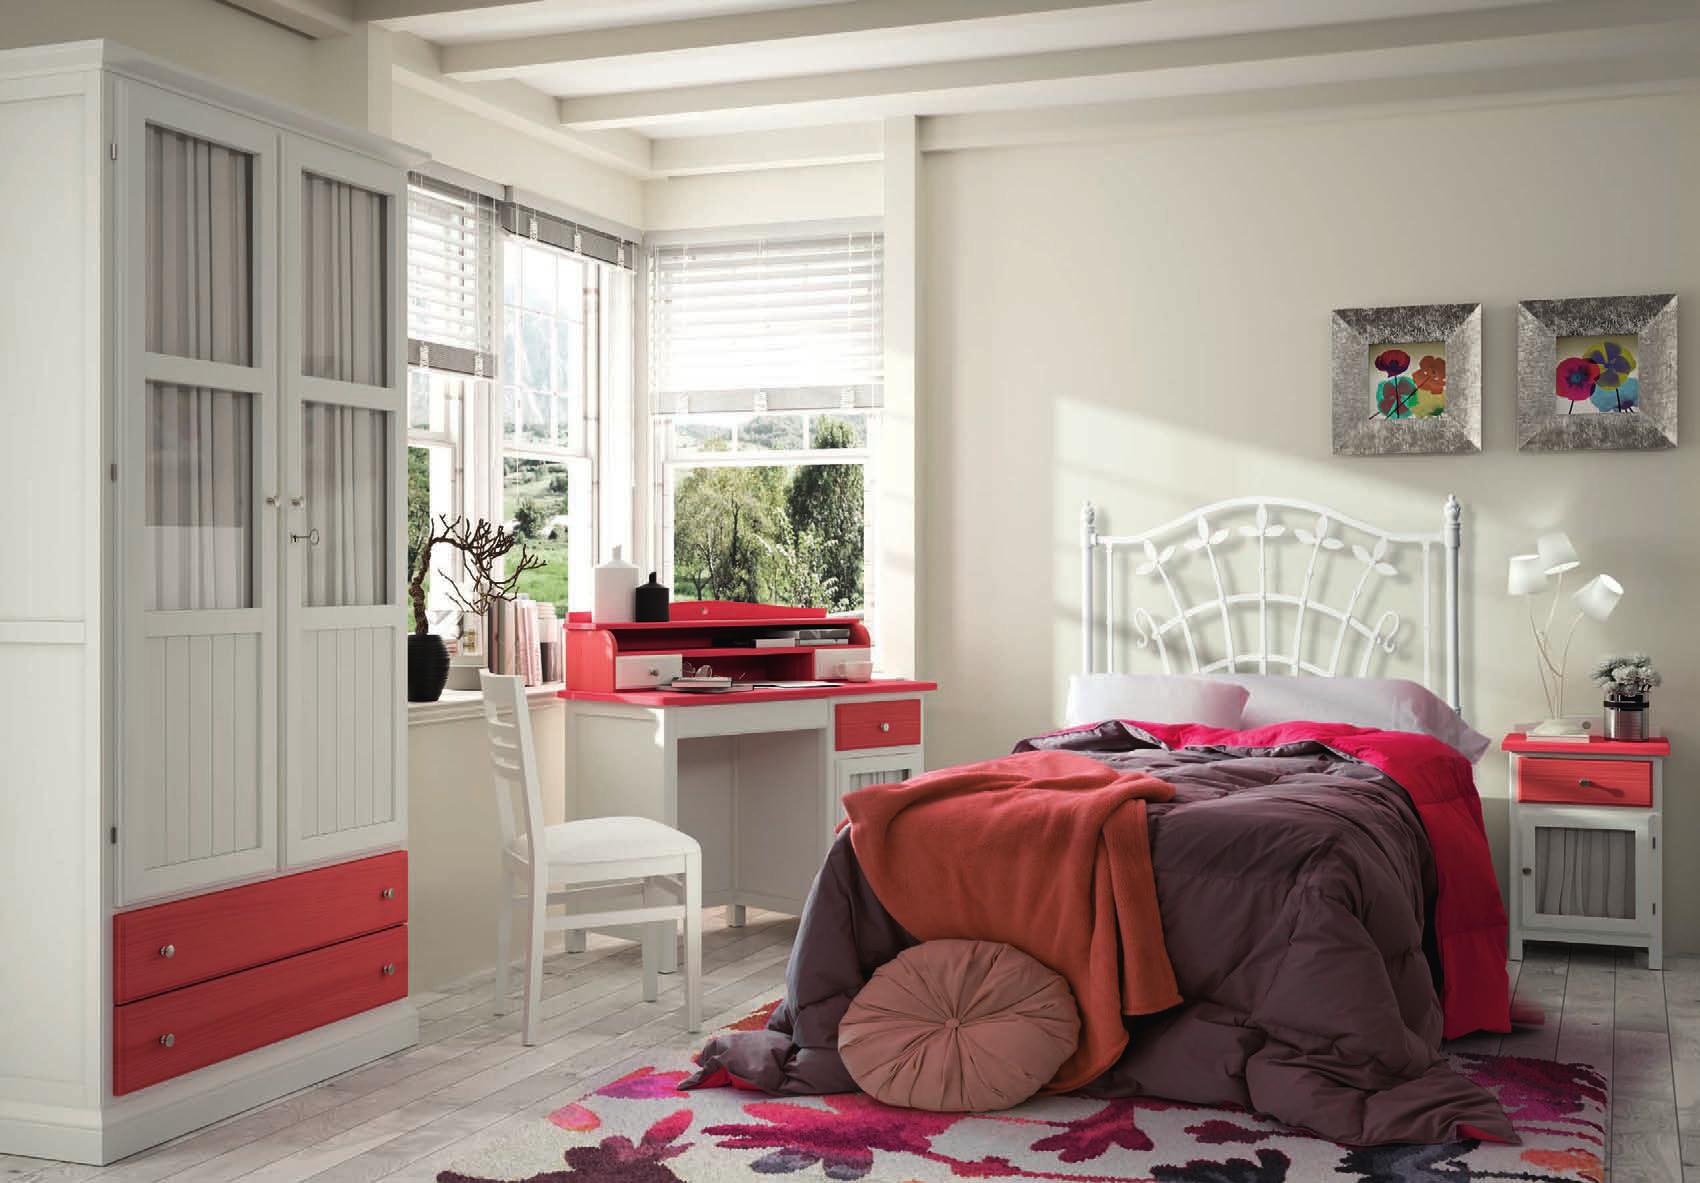 416-dormitorio-j-52